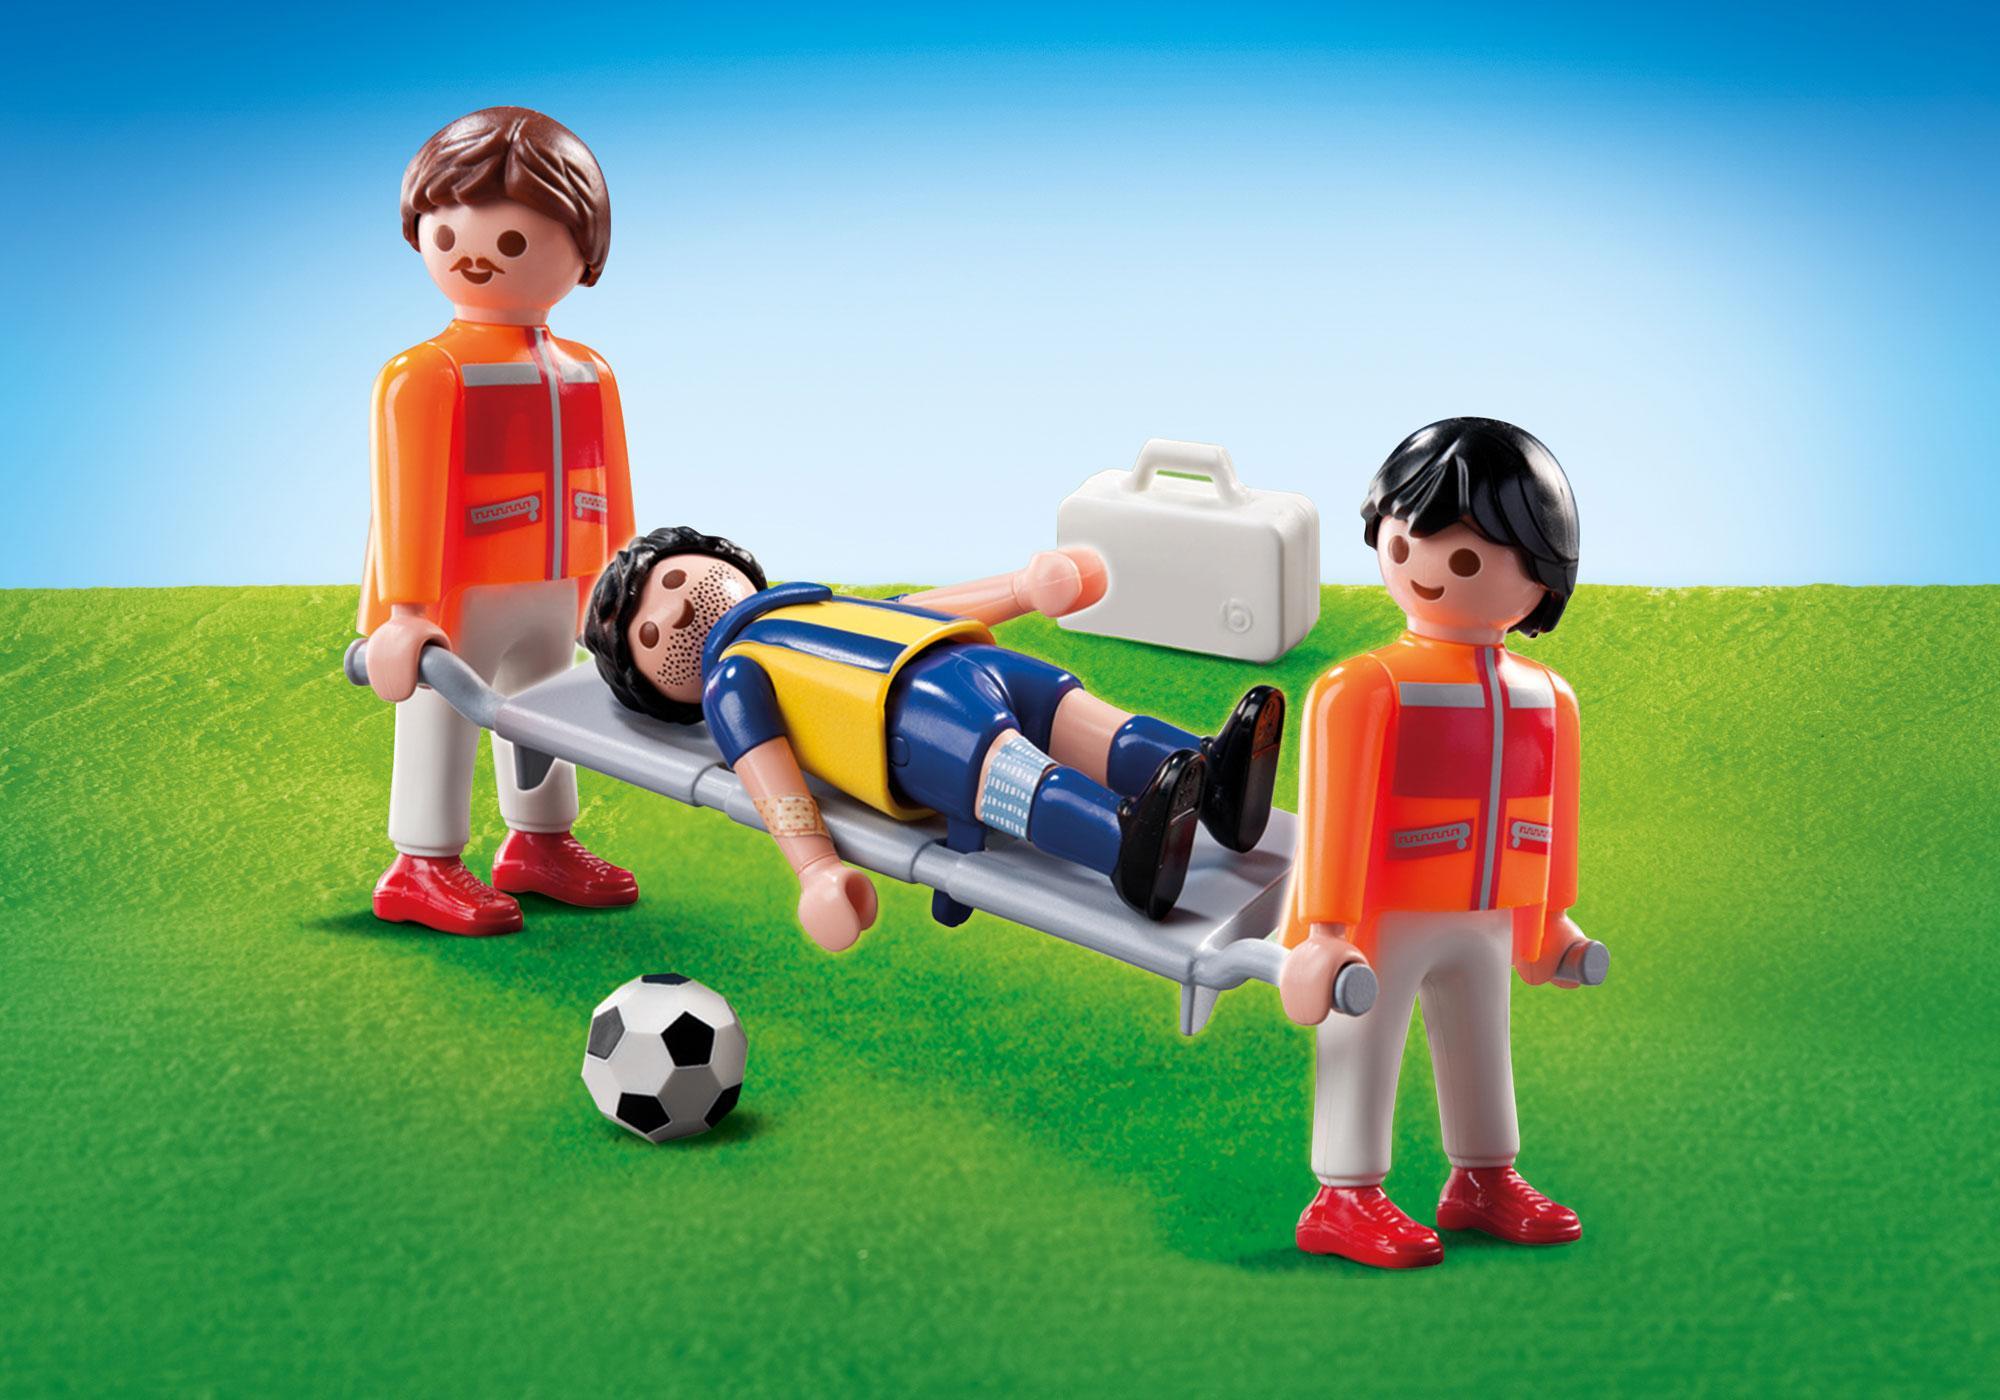 http://media.playmobil.com/i/playmobil/9826_product_detail/Paramedics with Soccer Player